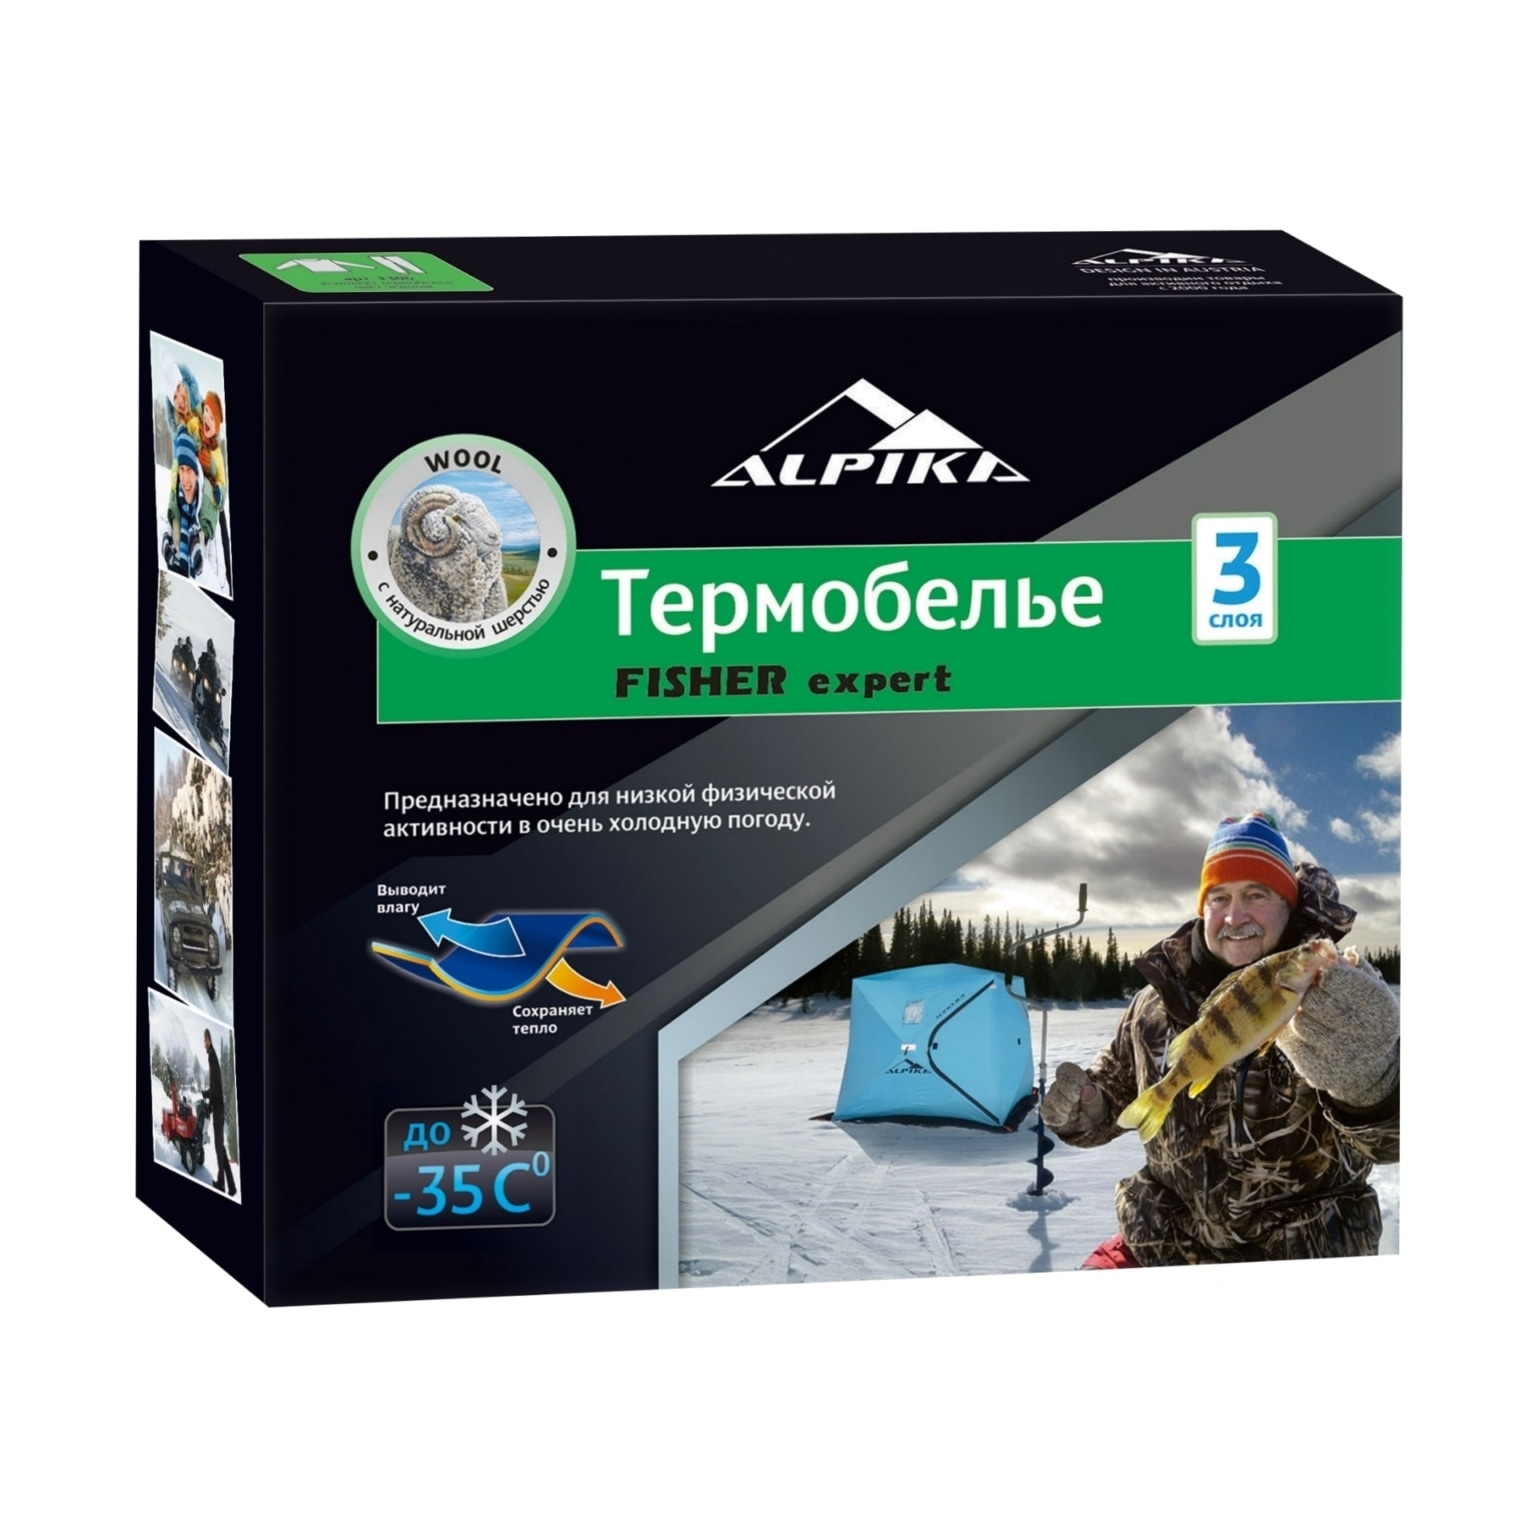 Термобелье ALPIKA Fisher Expert Т-07 до - 35°C